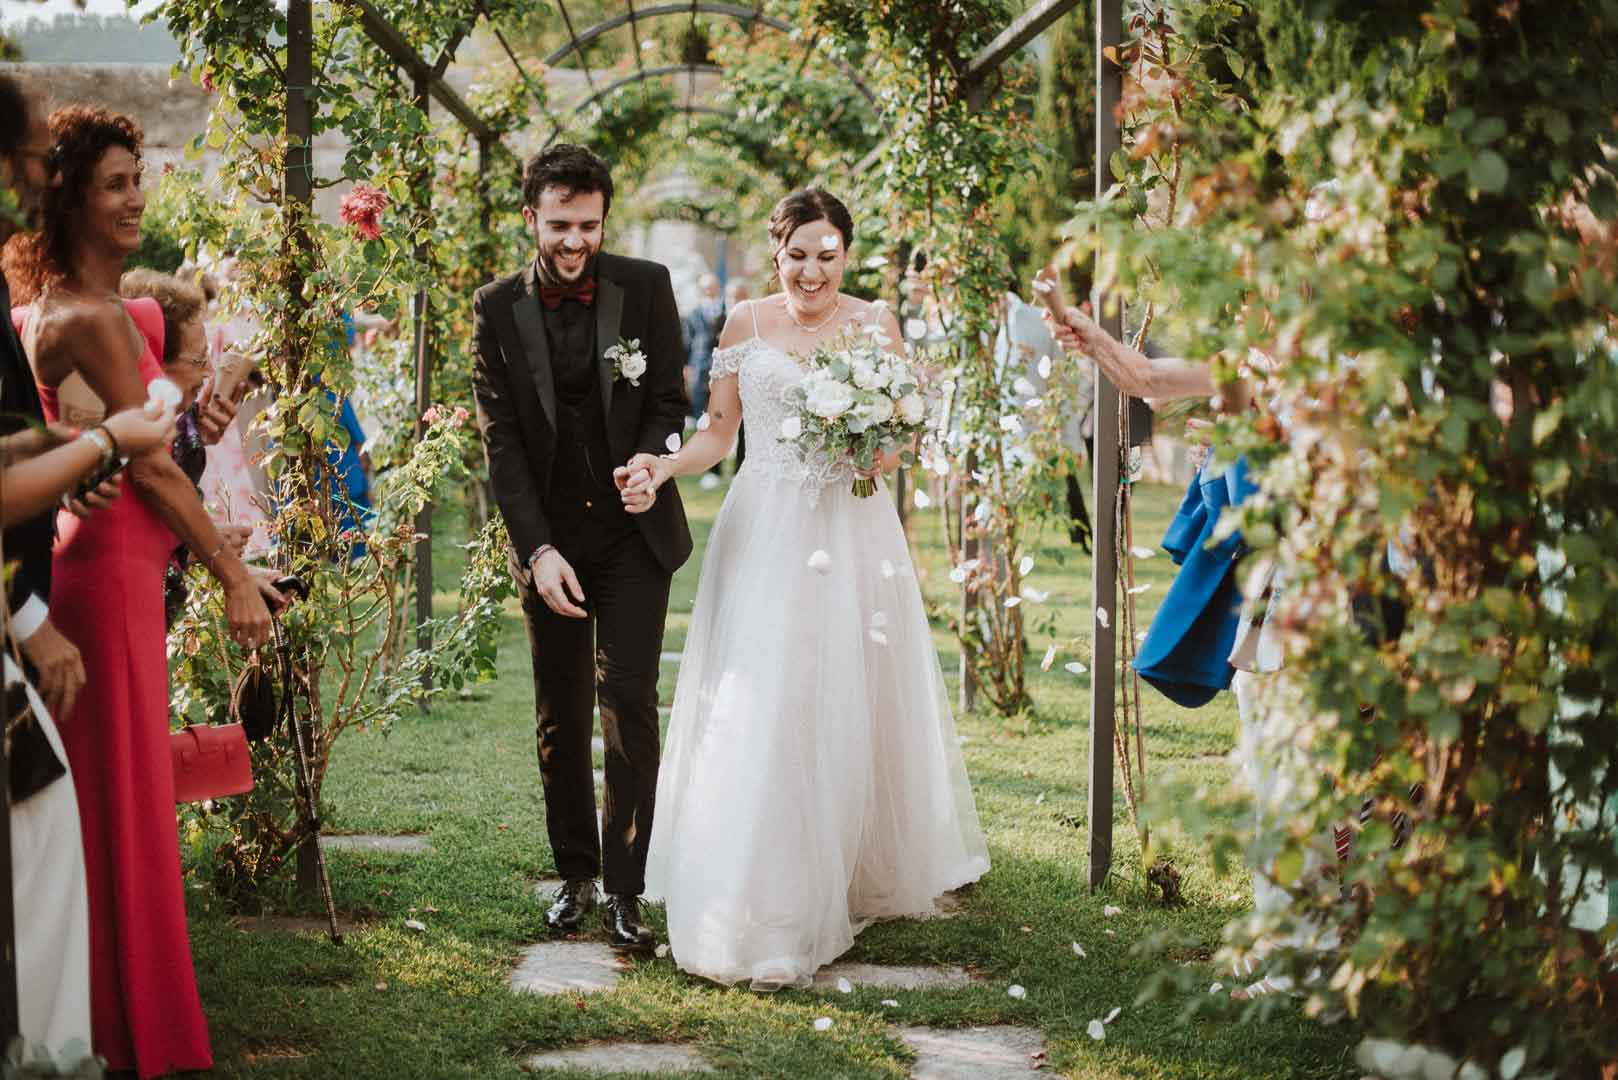 wedding-photographer-destination-fineart-bespoke-reportage-tuscany-villascorzi-vivianeizzo-spazio46-84